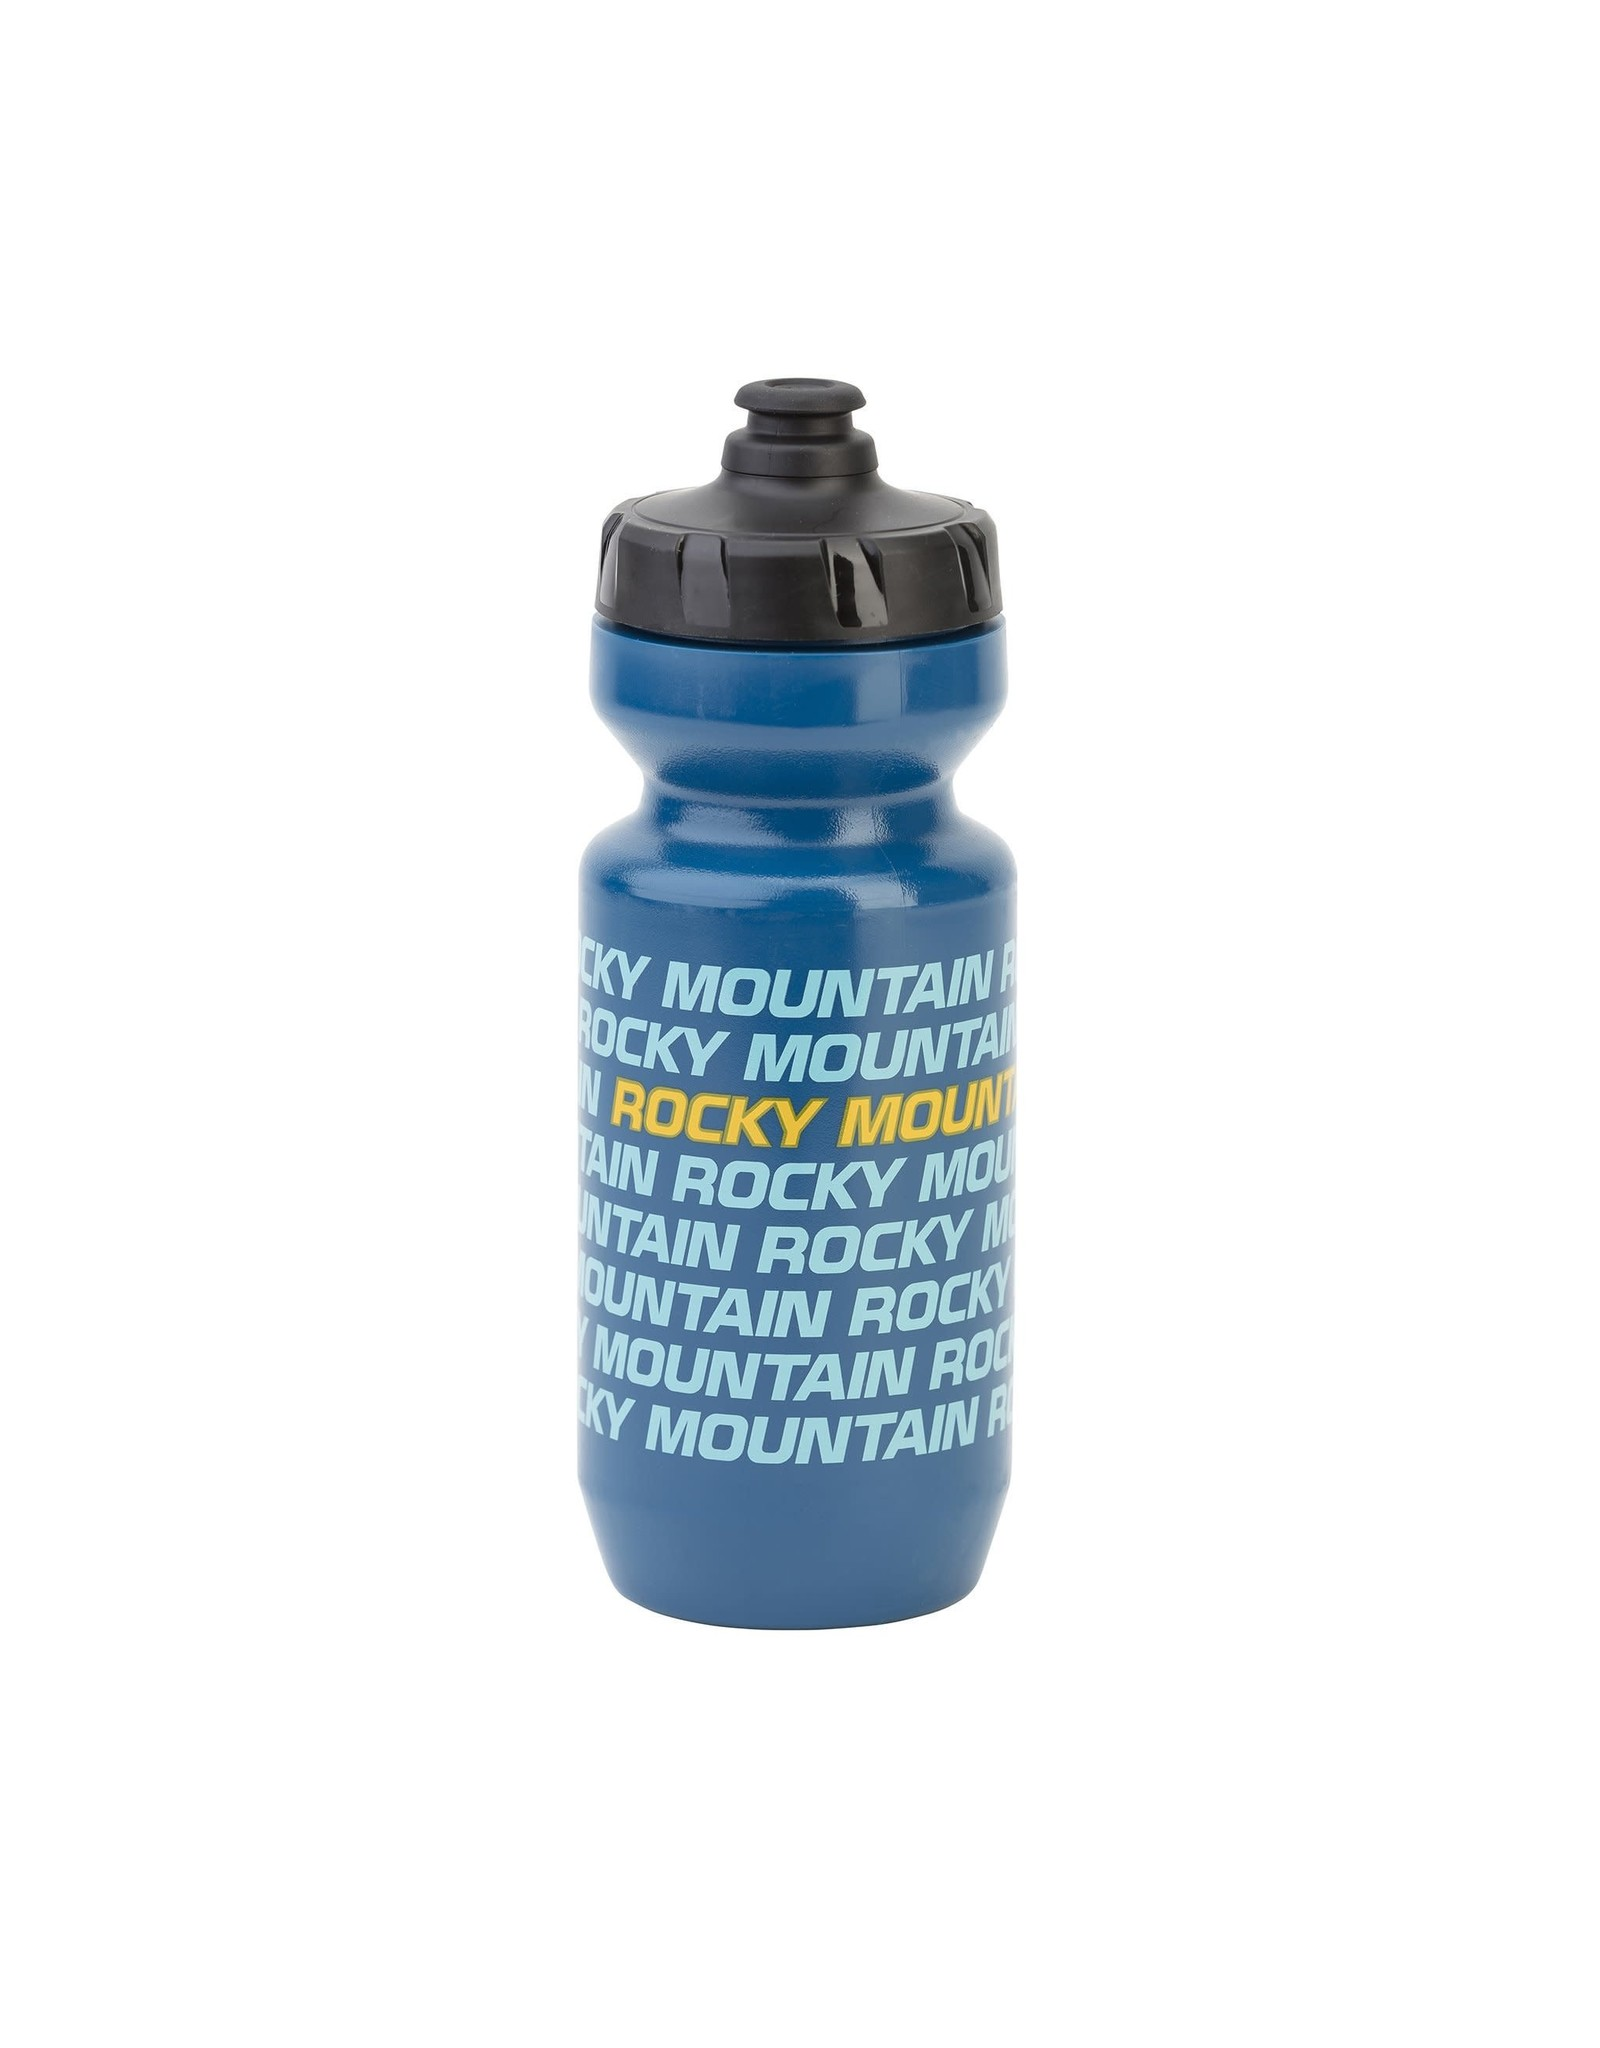 Rocky Mountain Rocky Mountain Bottle 22oz Navy